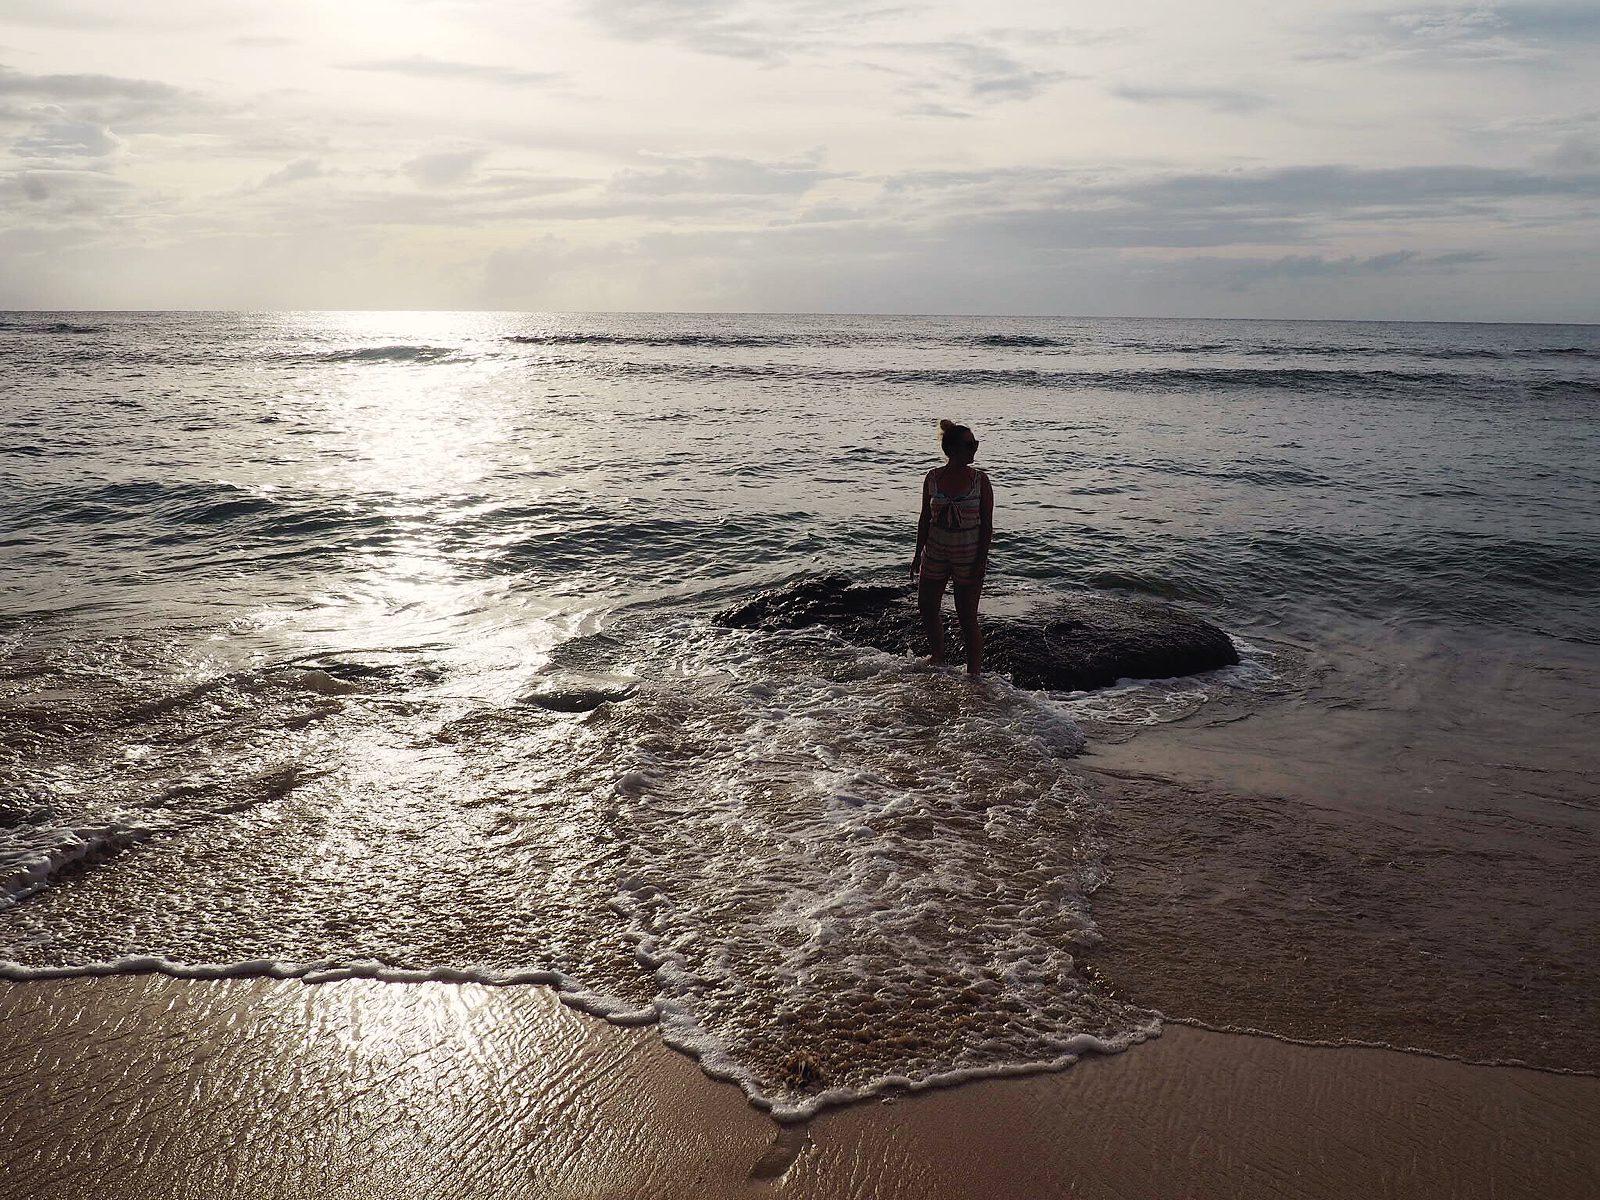 Not so dreamy experience in Fiji